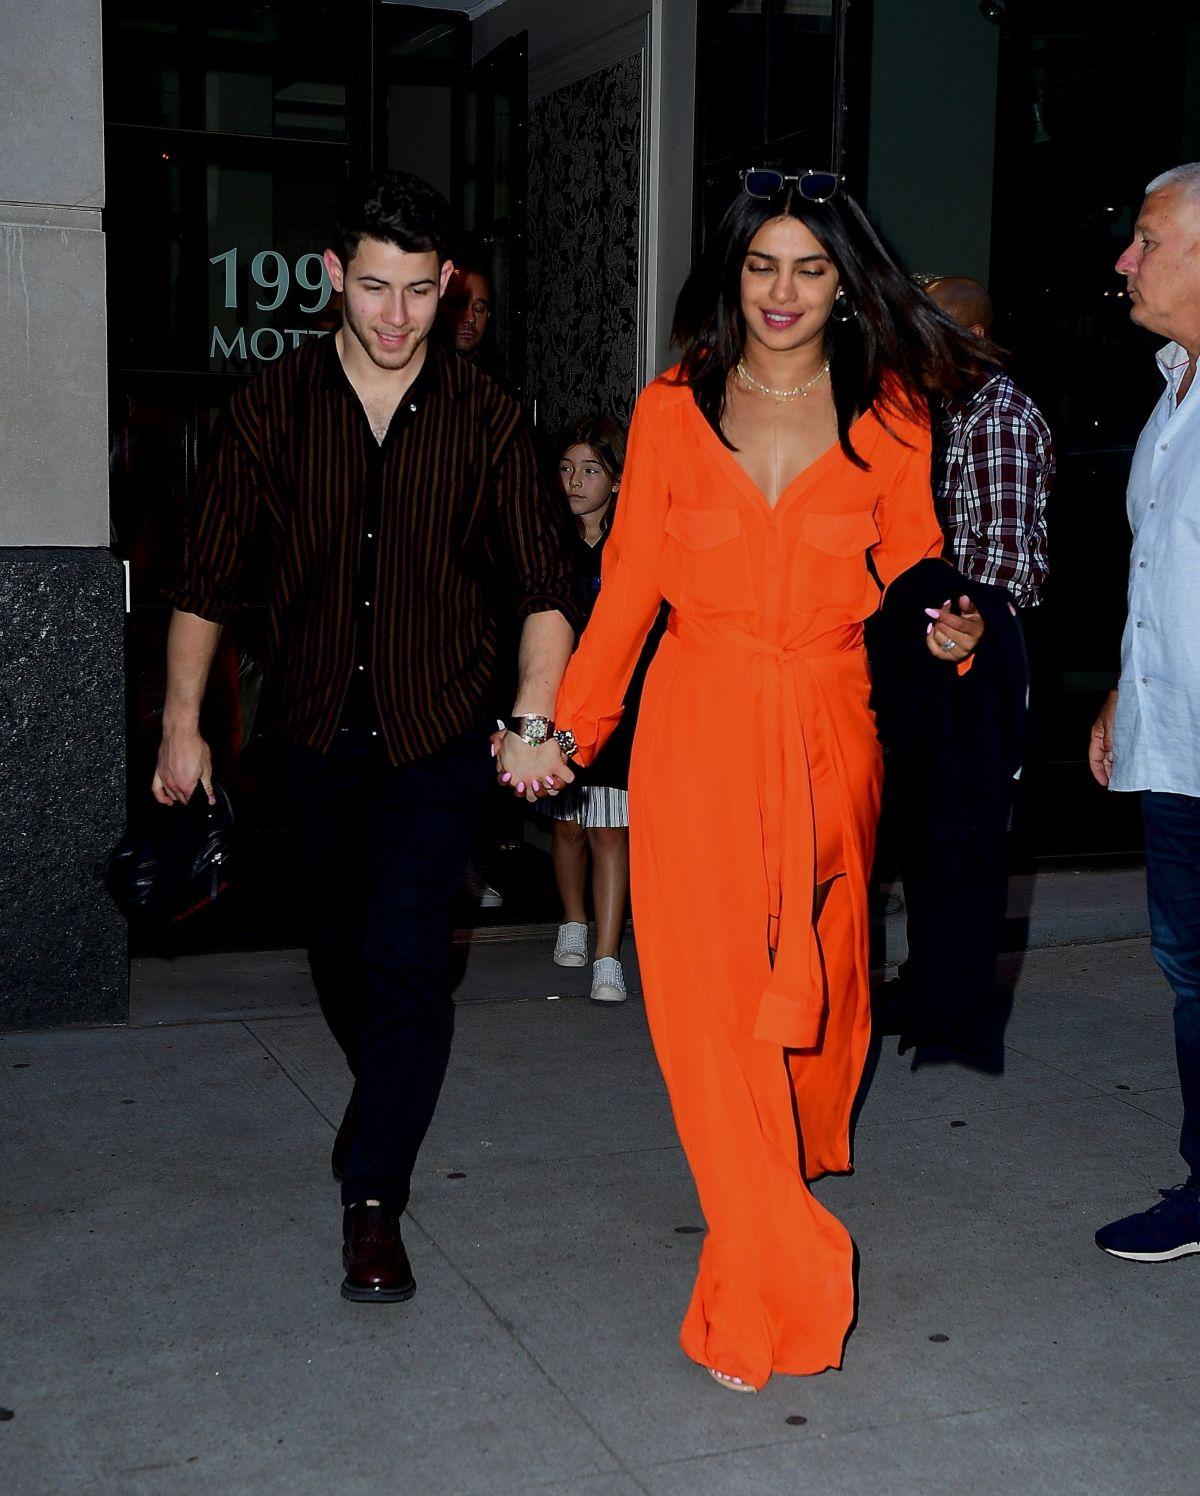 PRIYANKA CHOPRA And Nick Jonas Out In New York 06/15/2019